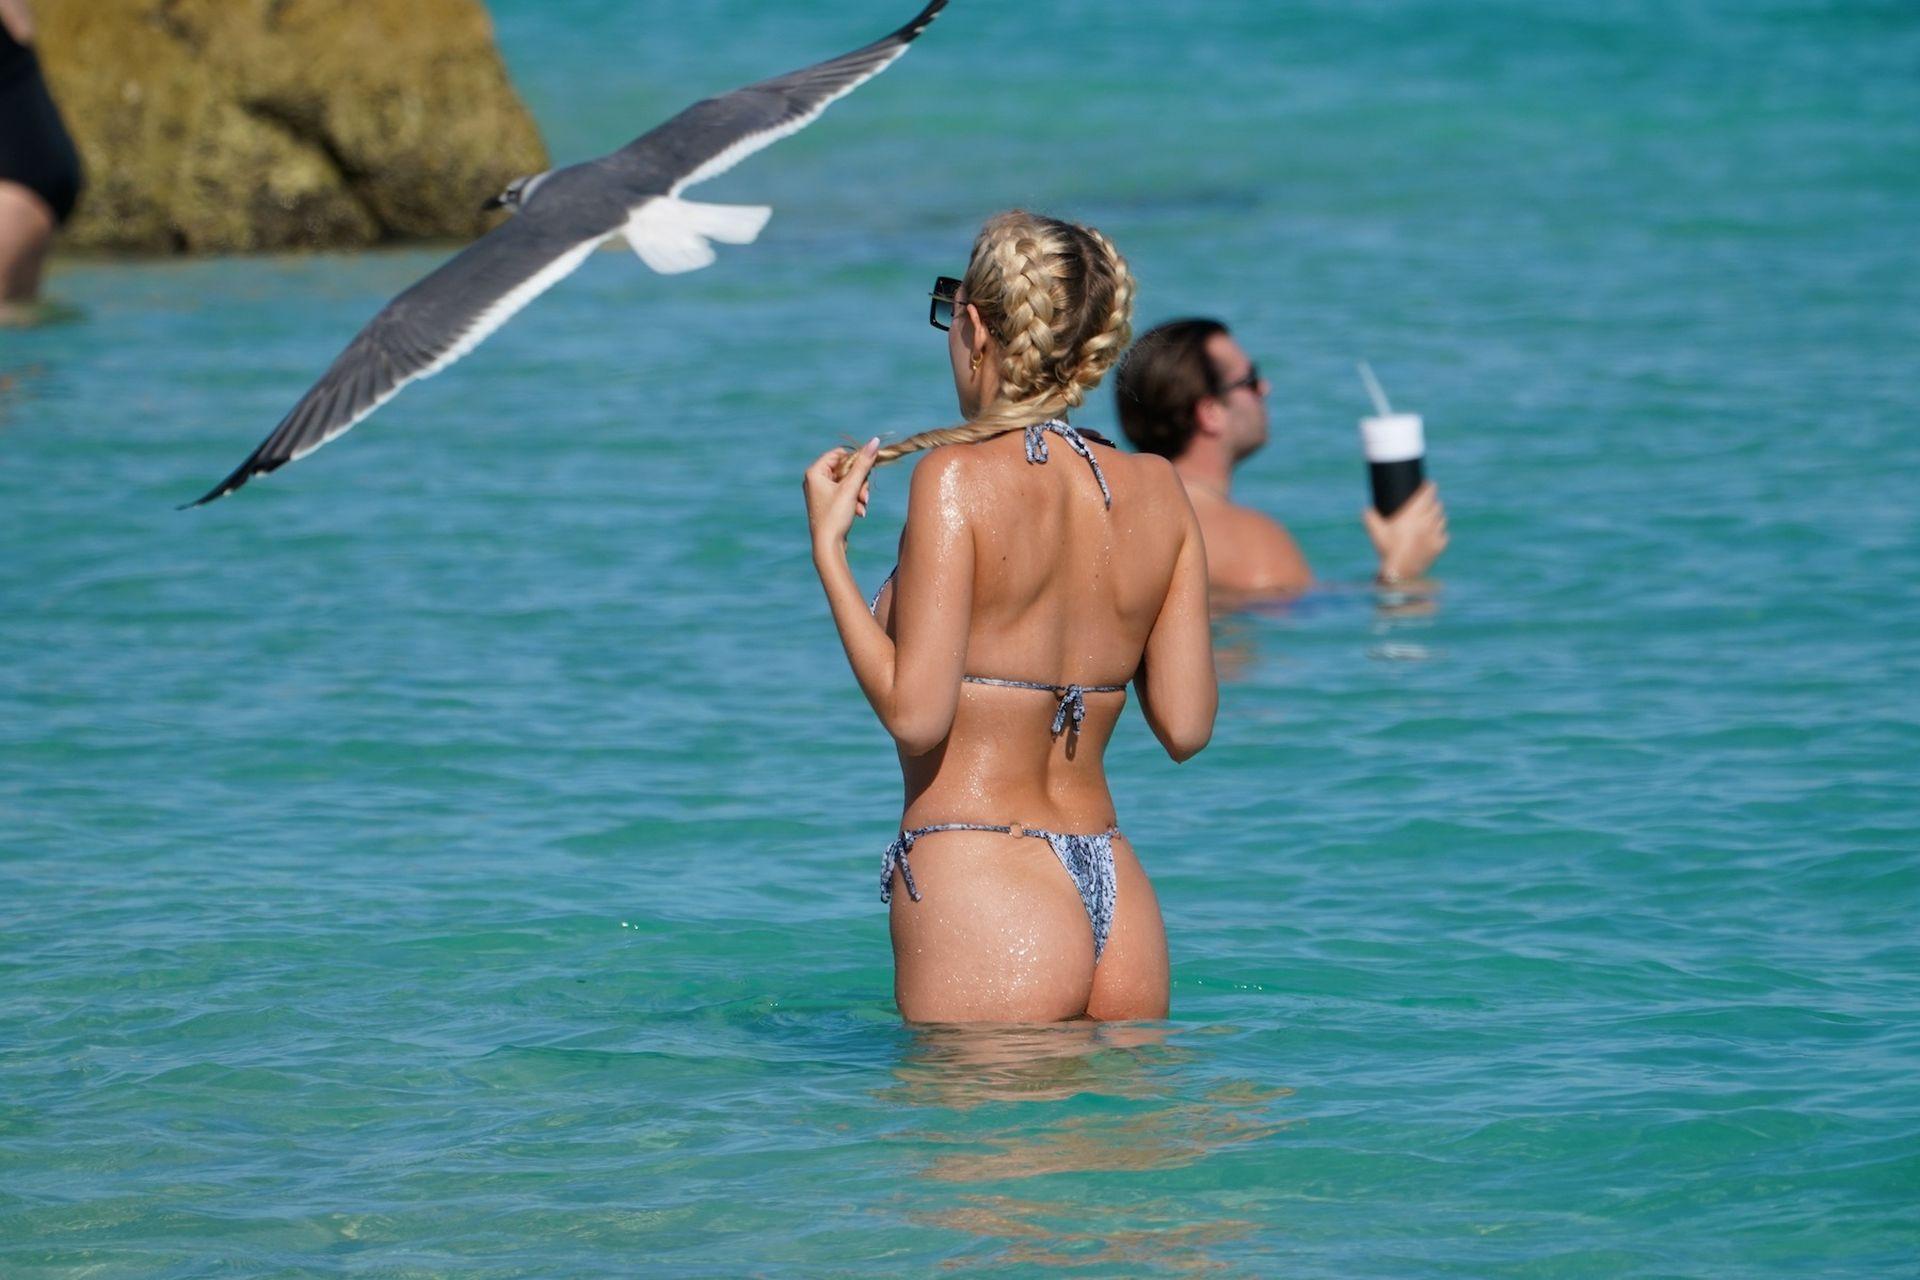 Chealse Sophia Howell Shows A Thong Bikini At The Beach In Miami 0017